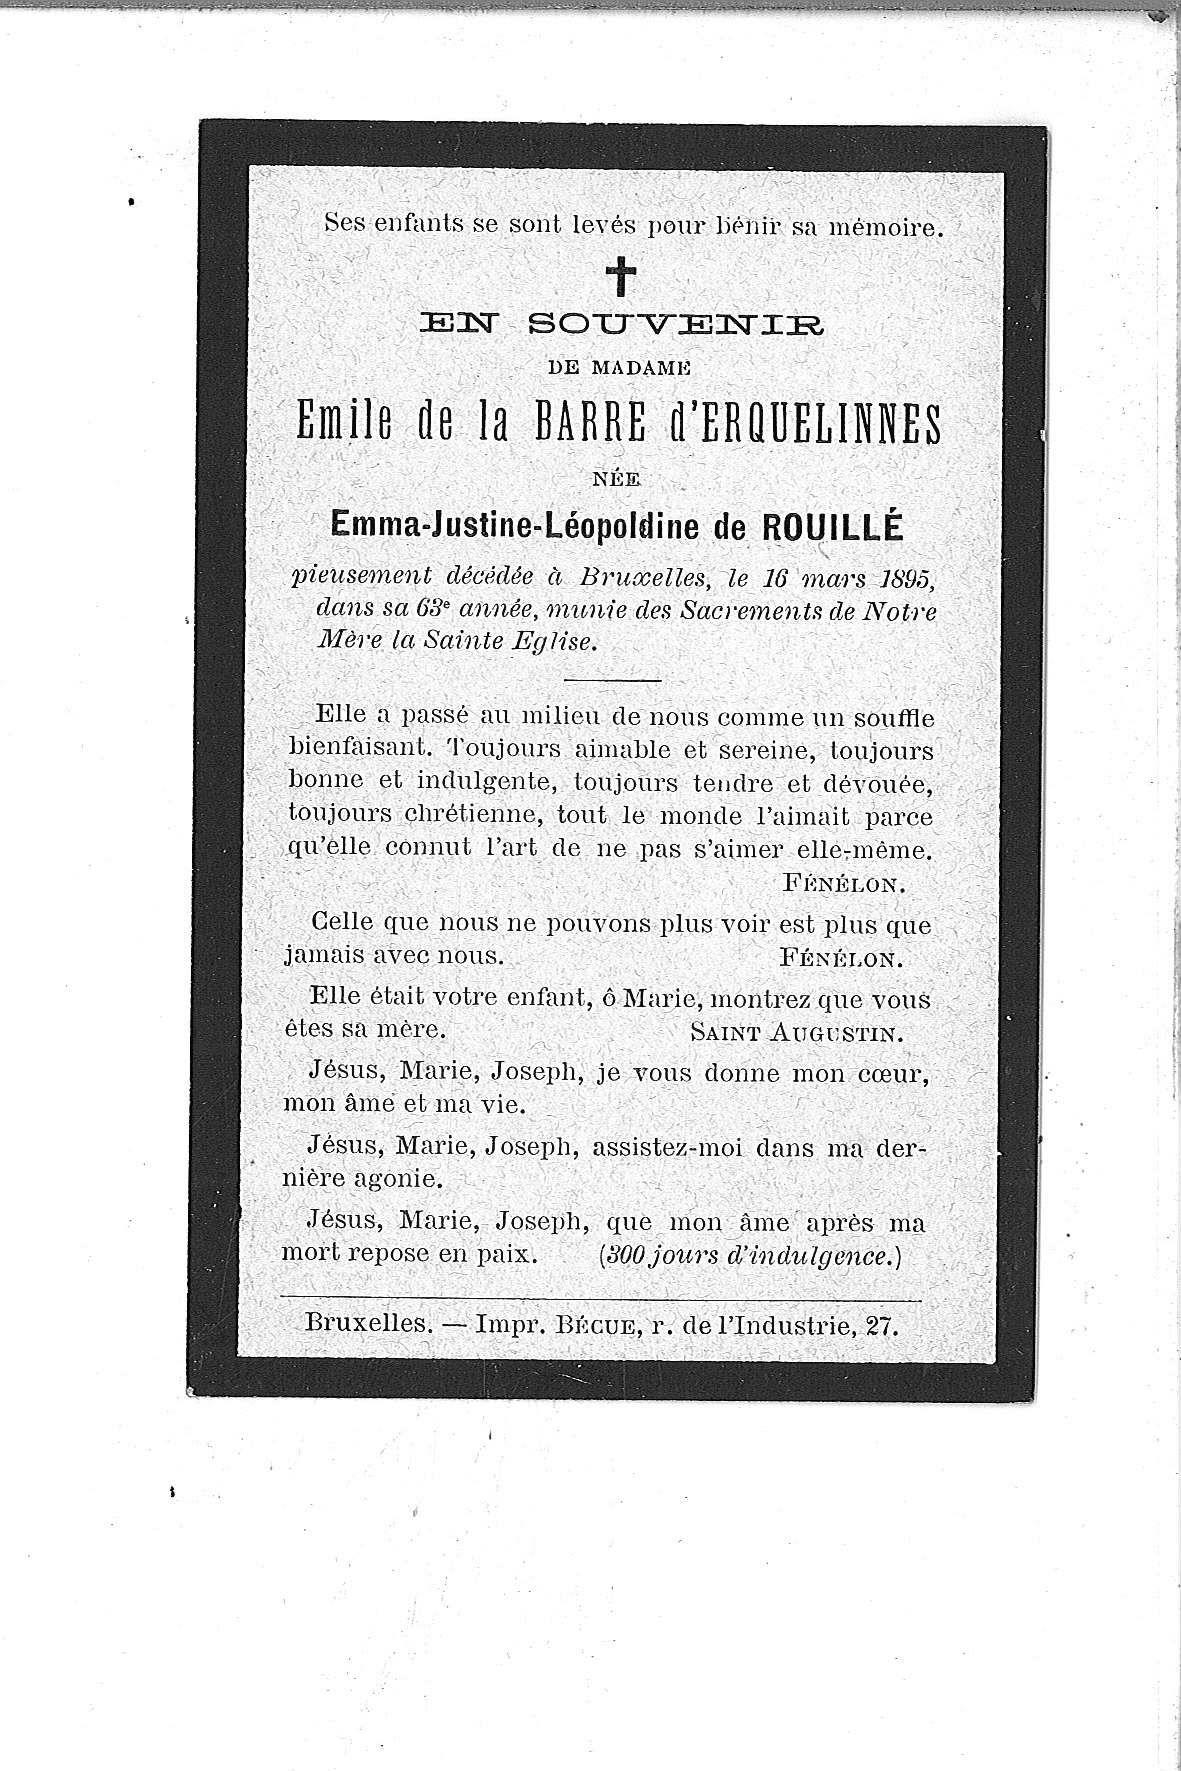 Emma-Justine-Léopoldine-(1895)-20120906154301_00151.jpg